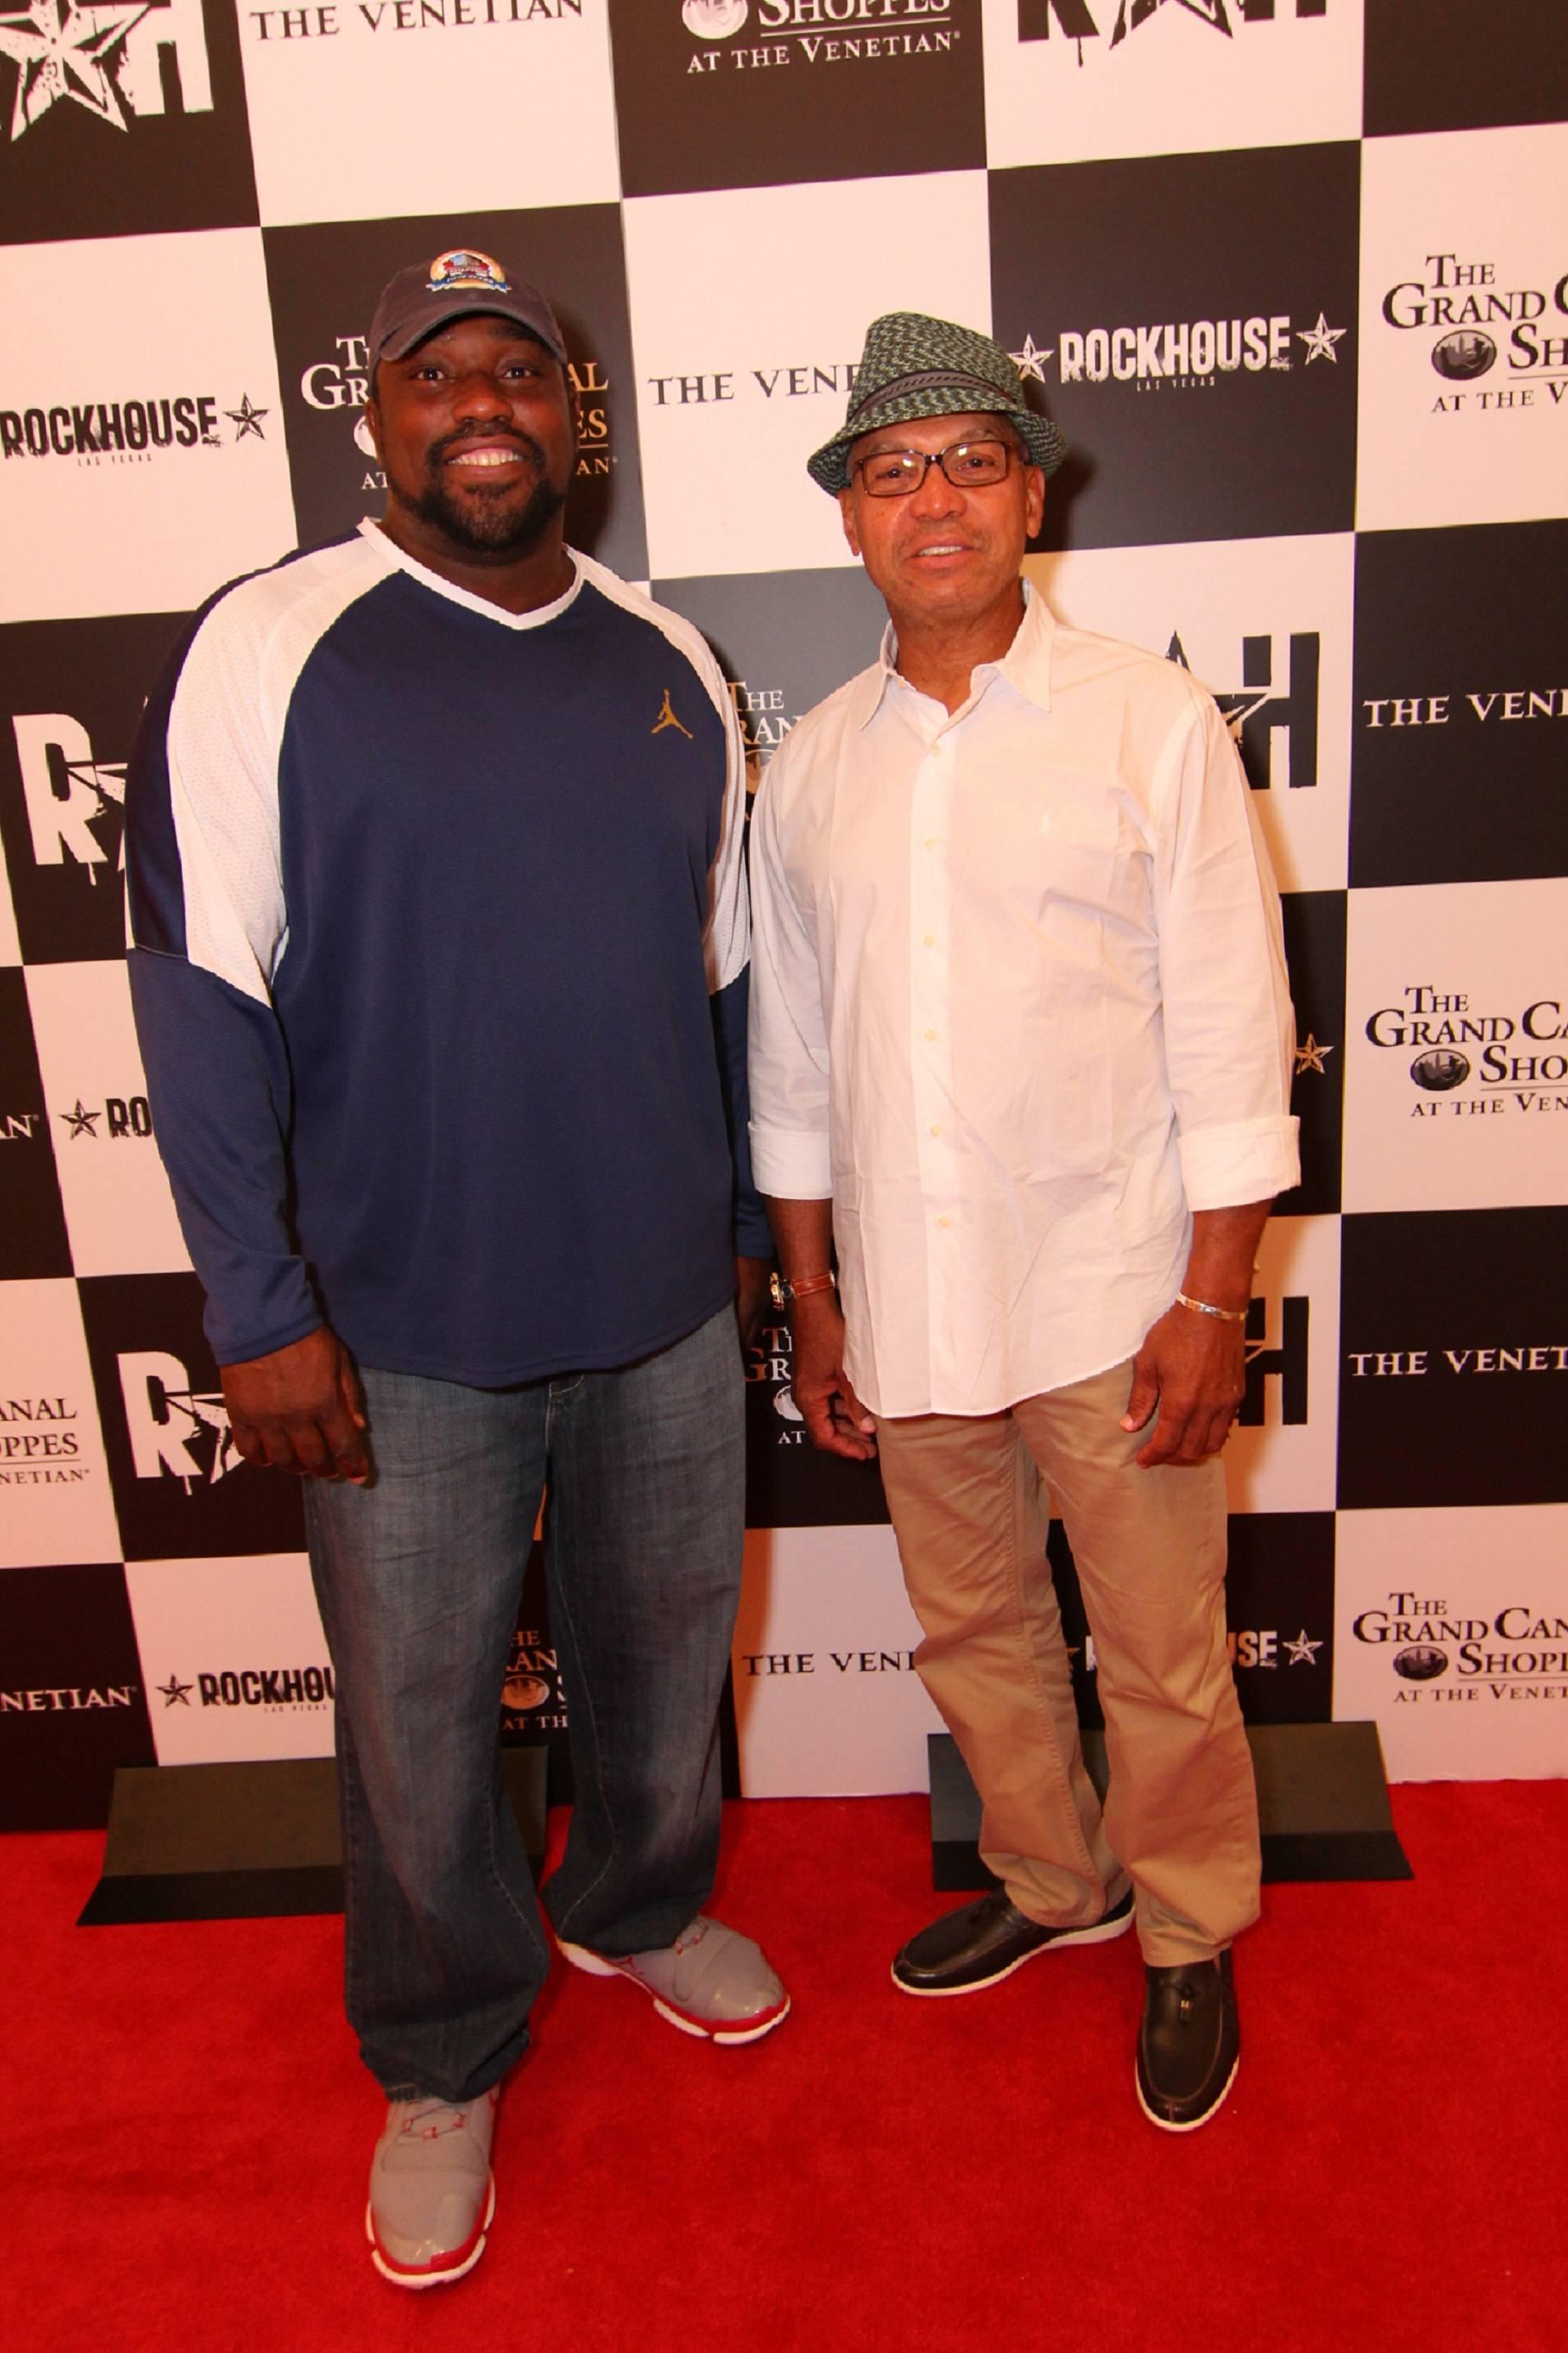 Warren Sapp and Reggie Jackson at Rockhouse